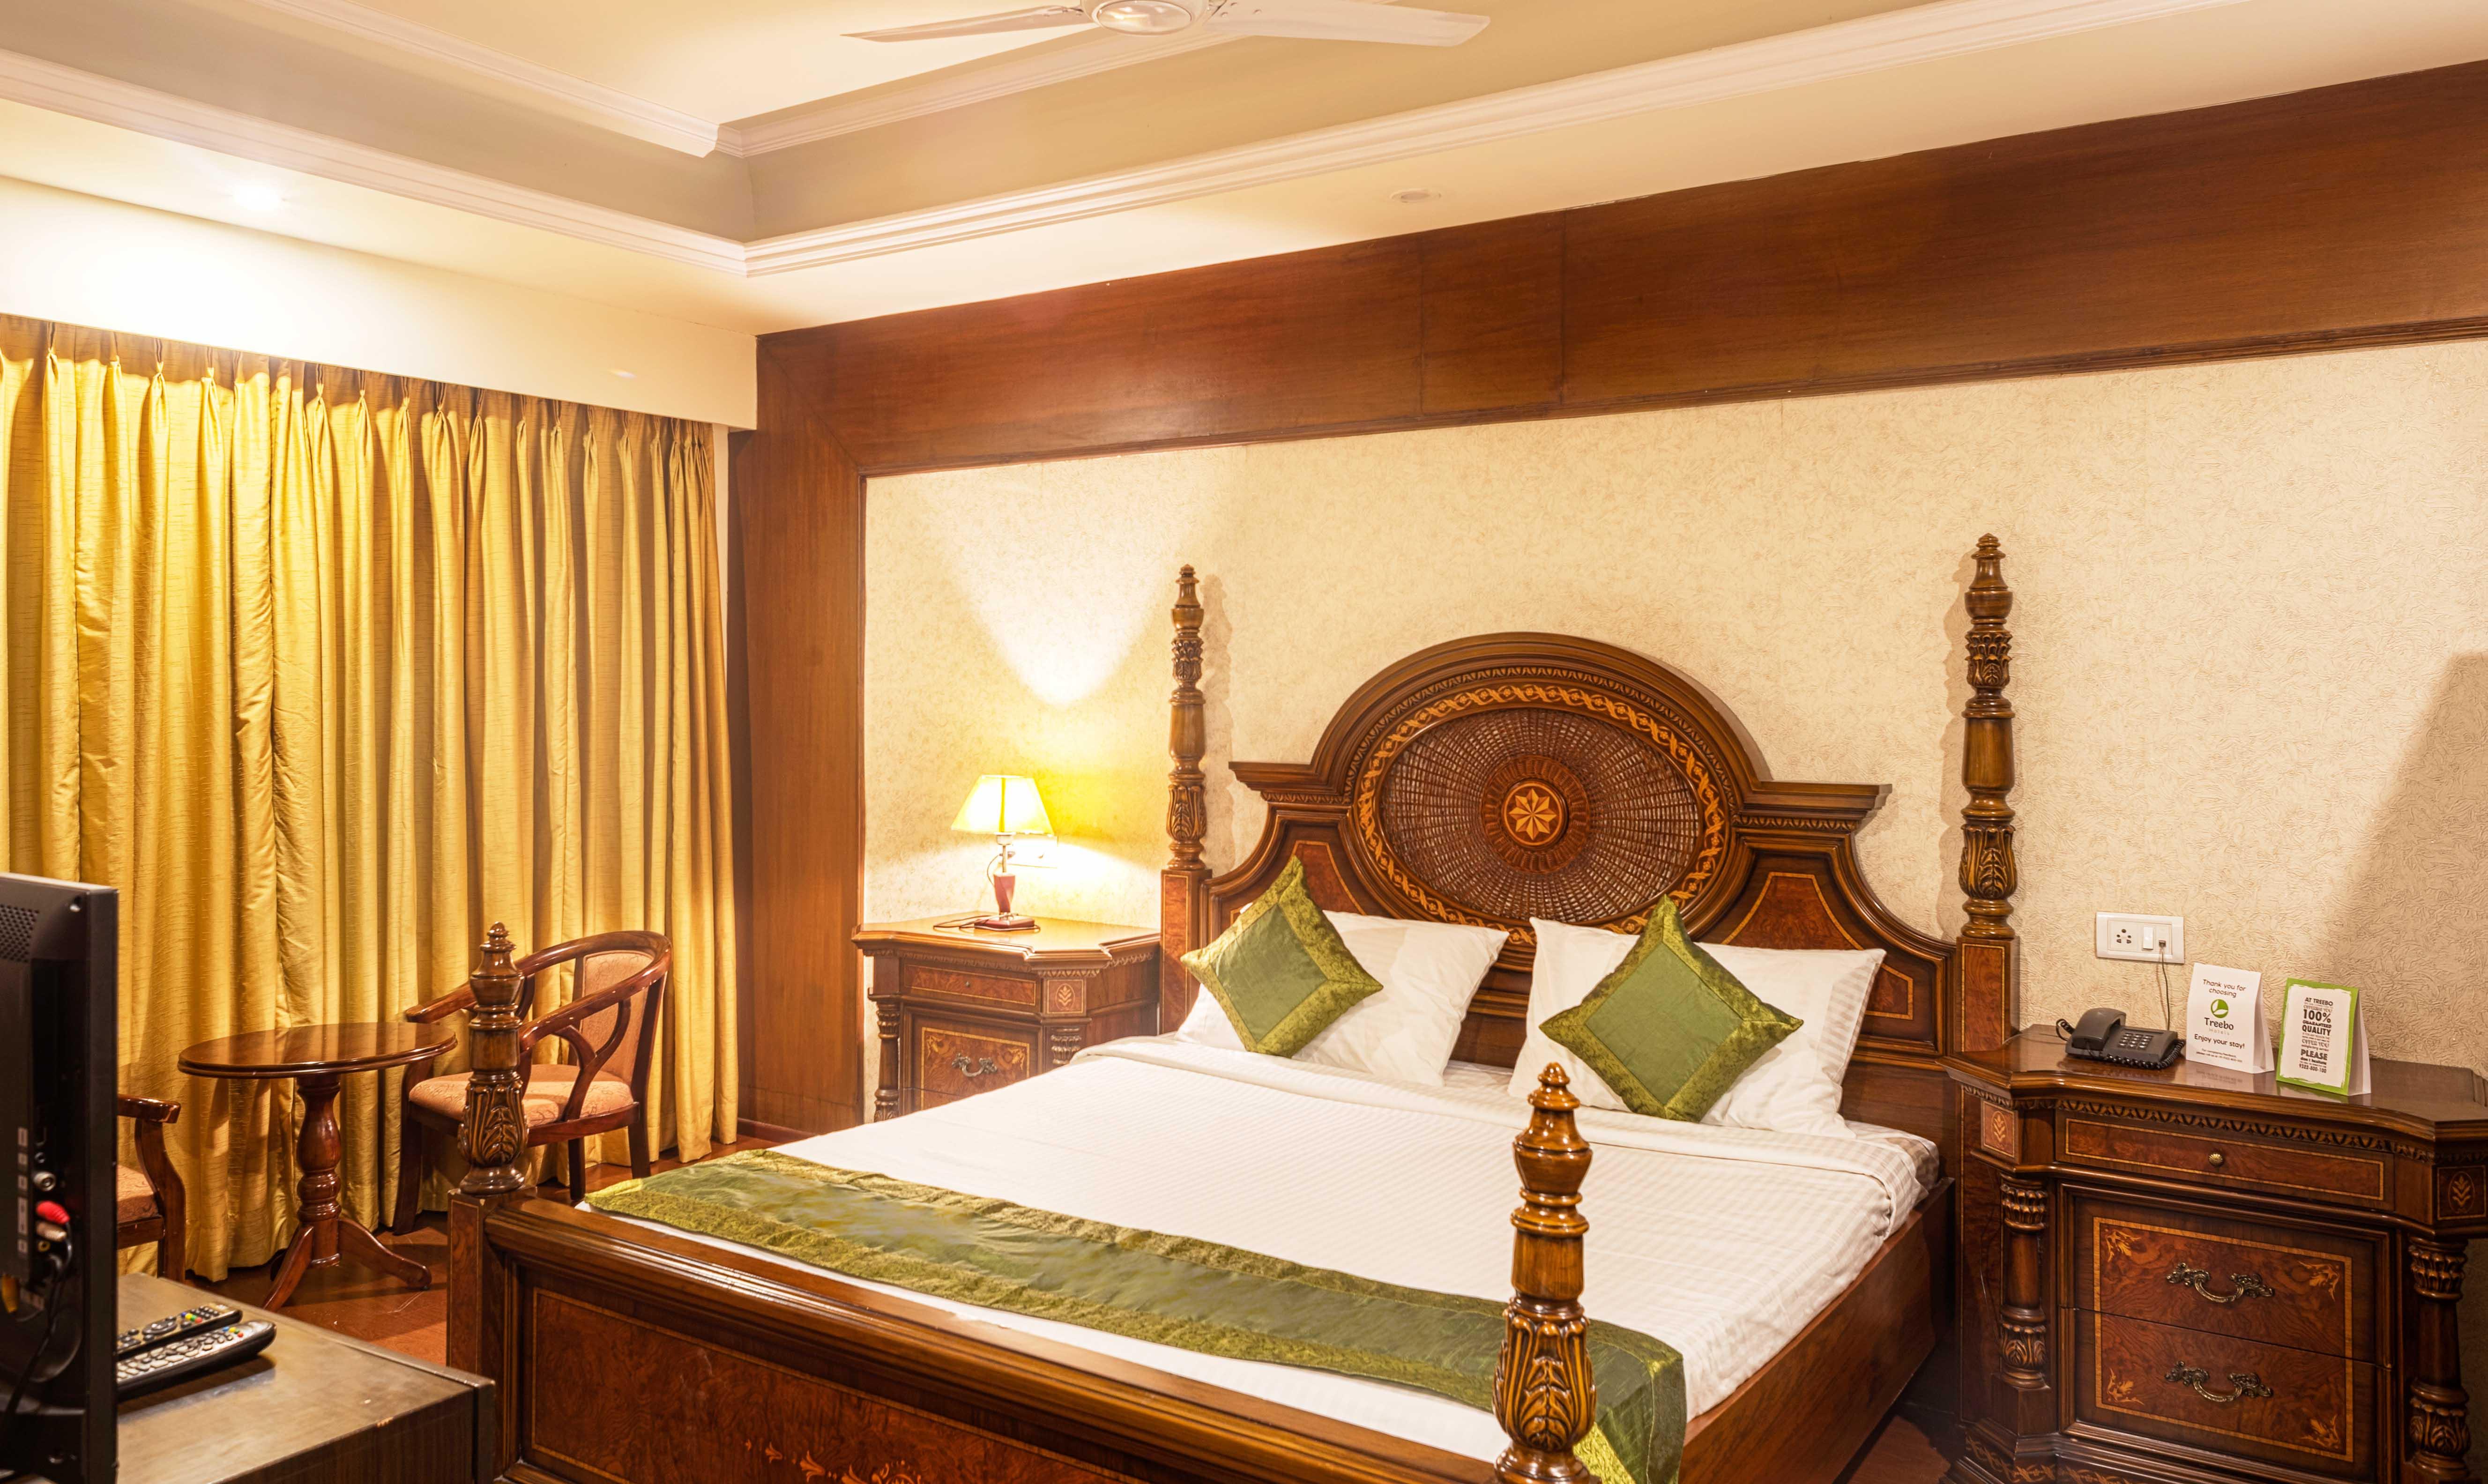 Free chat hookup rooms karachi airport hotel